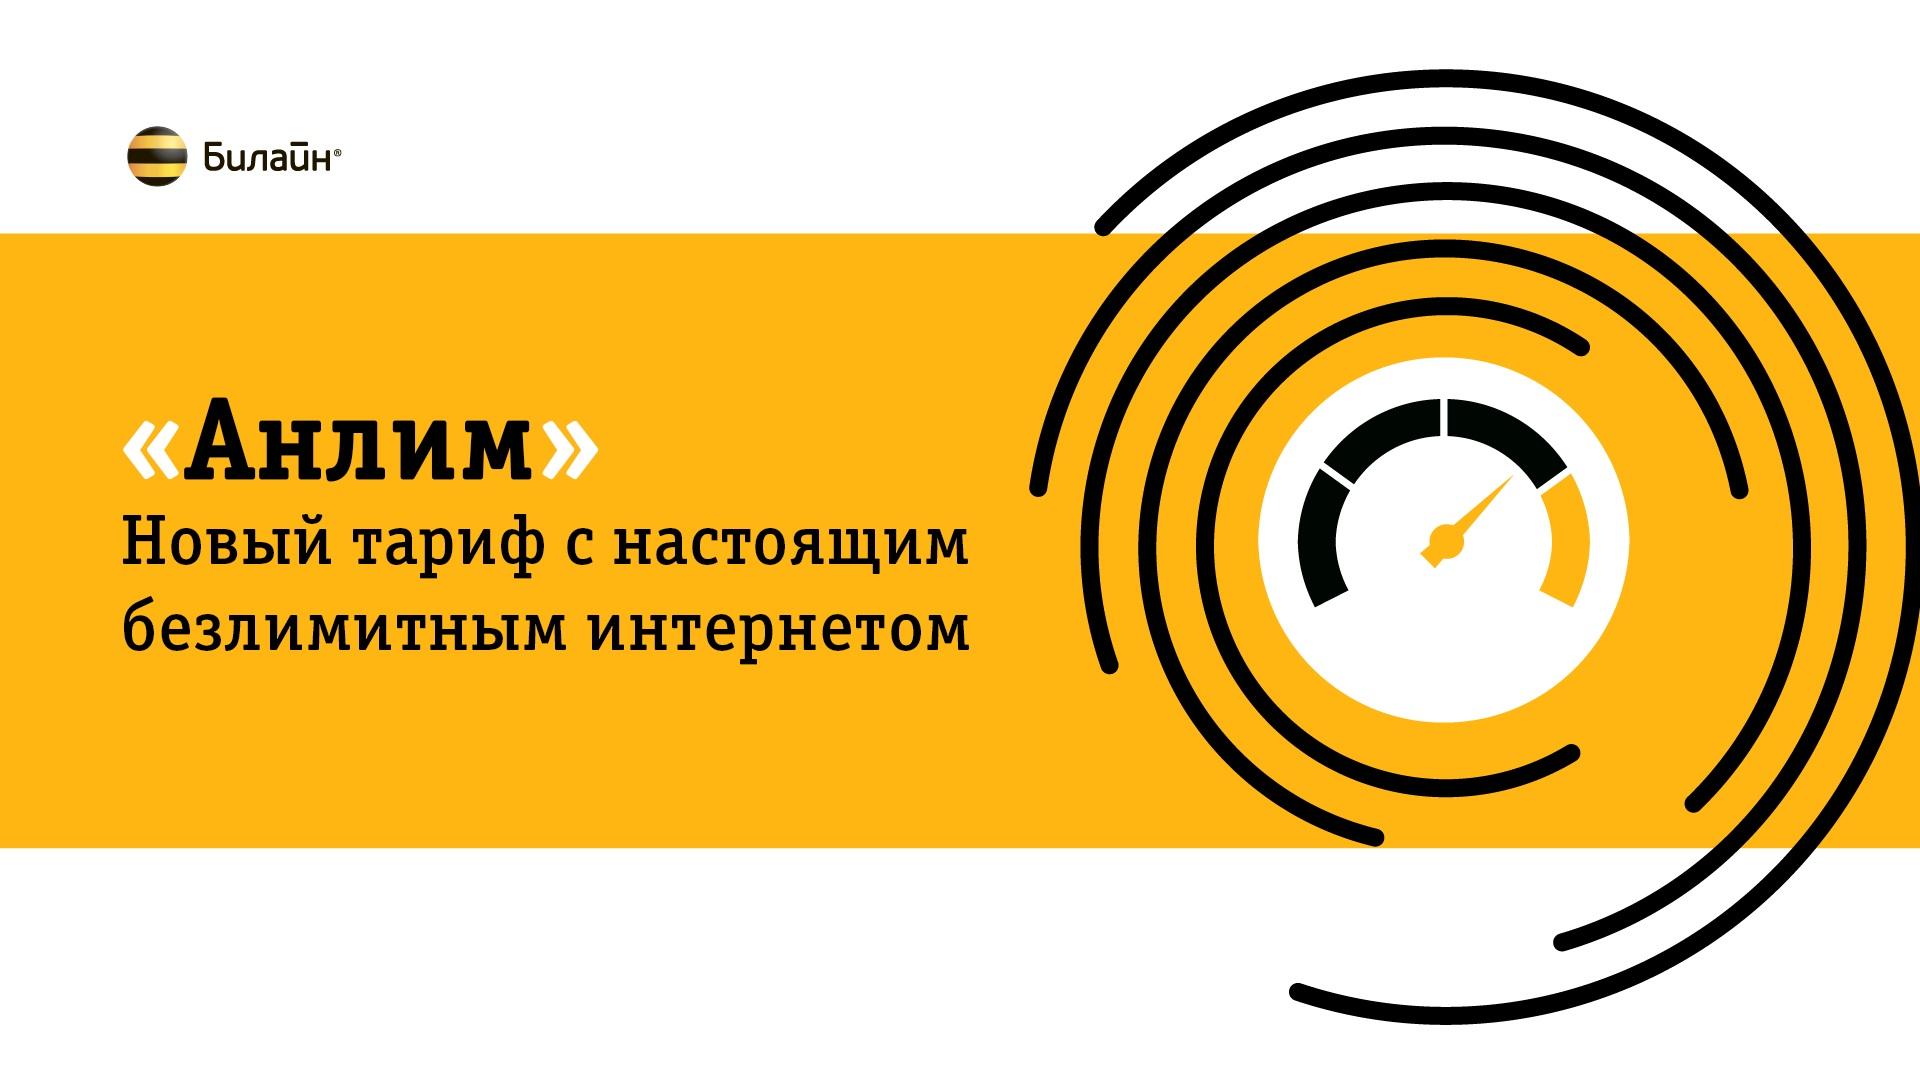 Билайн запустил тариф «Анлим» за 1 руб/сутки 1